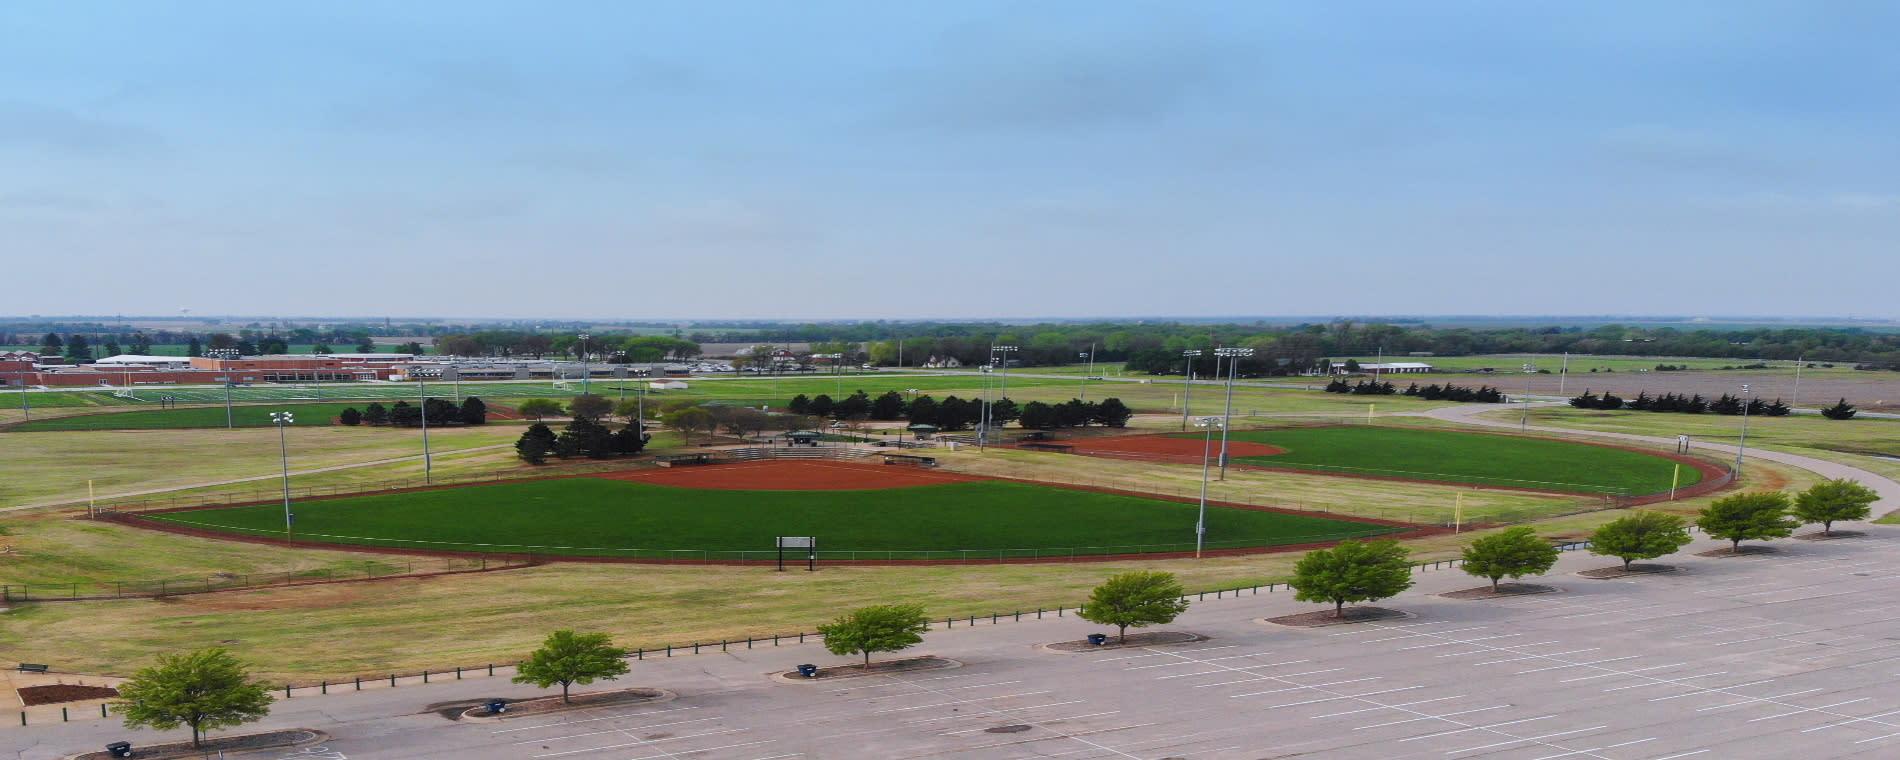 Southlakes Softball